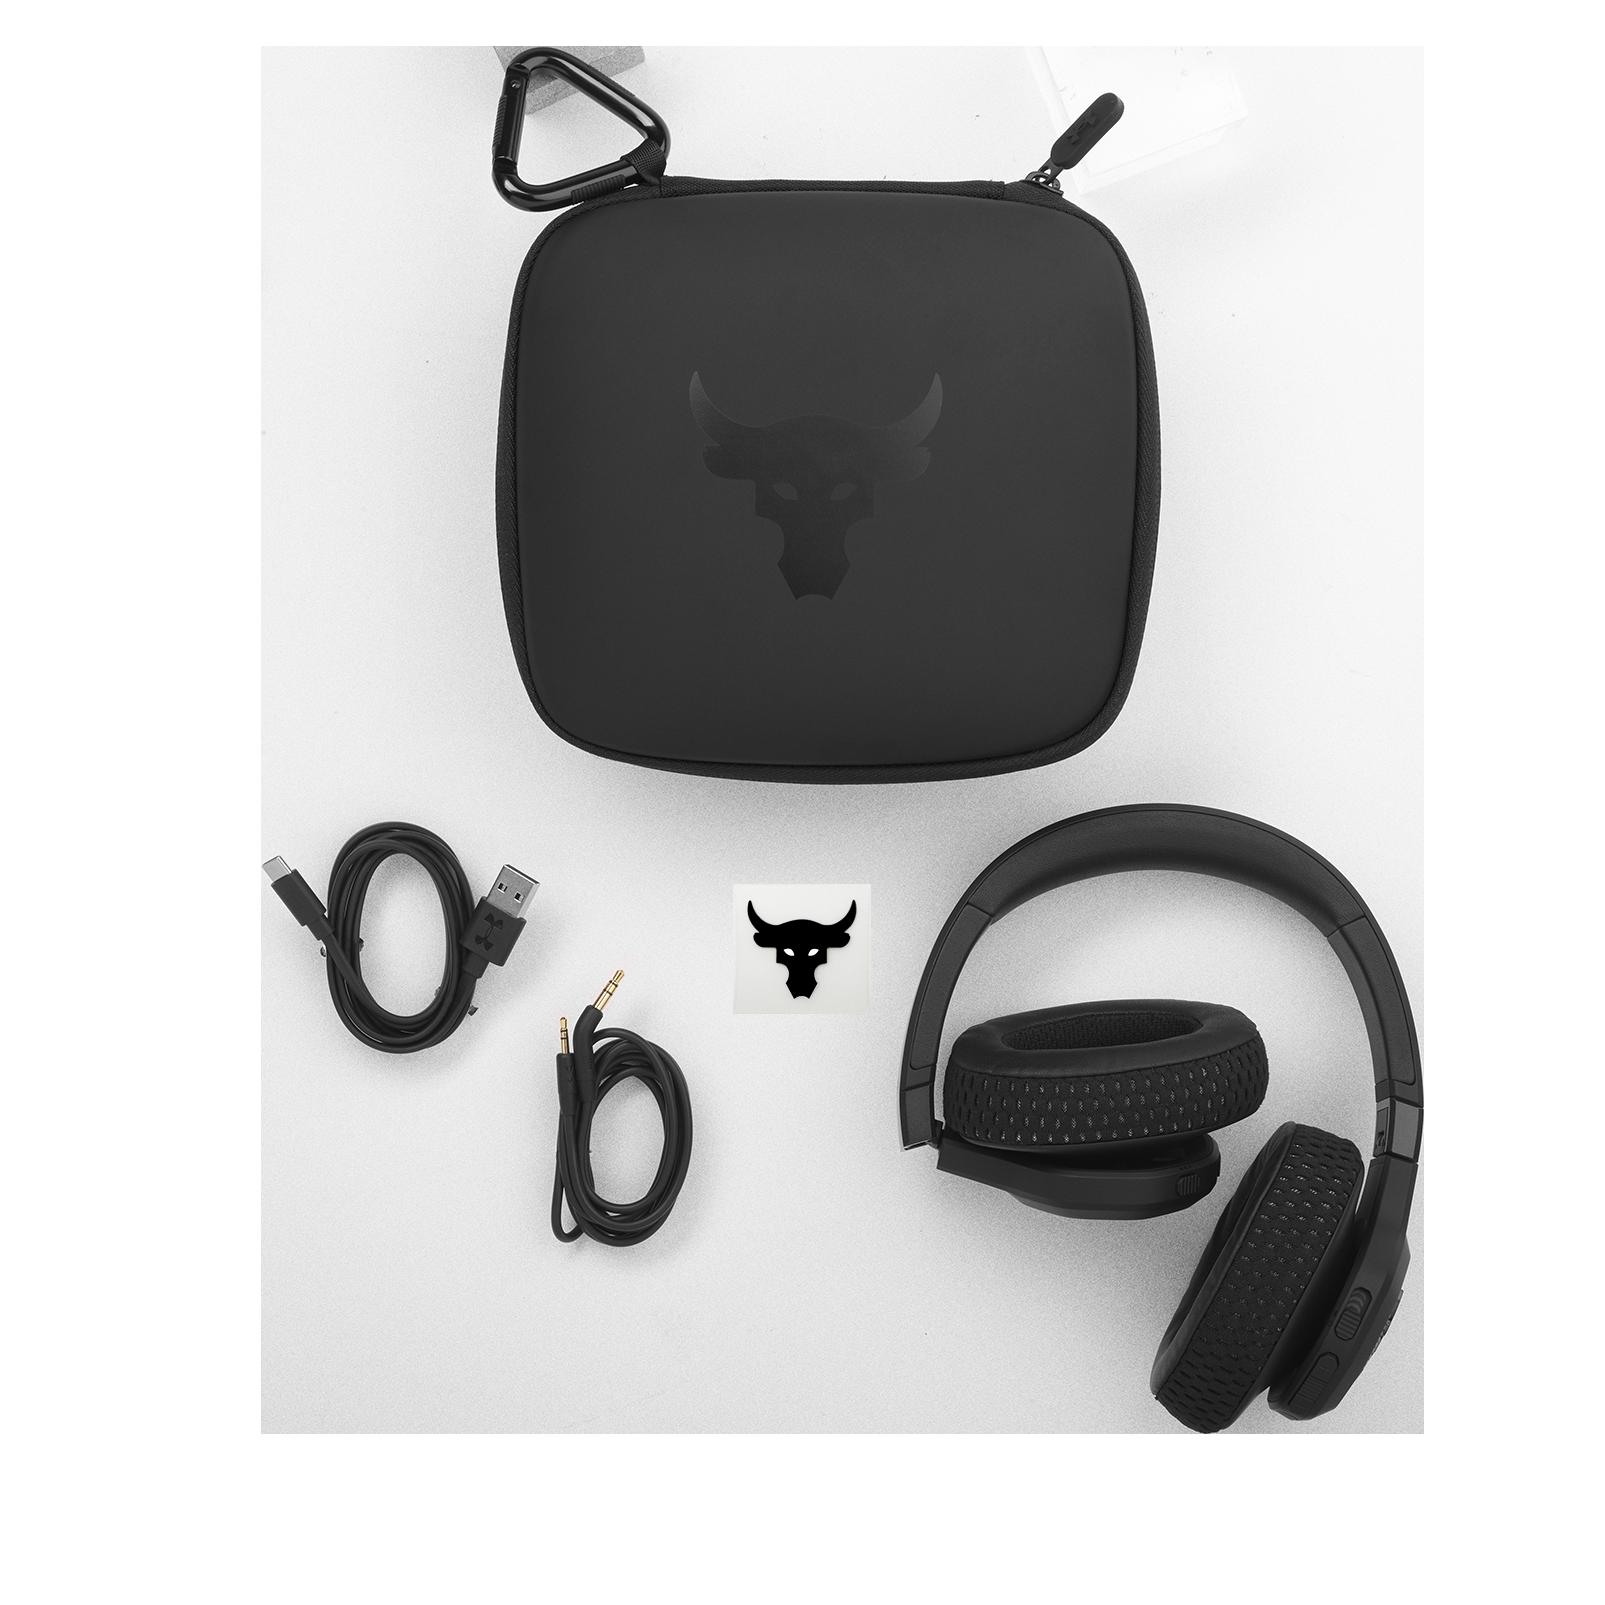 UA Project Rock Over-Ear Training Headphones - Engineered by JBL - Black - Over-Ear ANC Sport Headphones - Detailshot 5